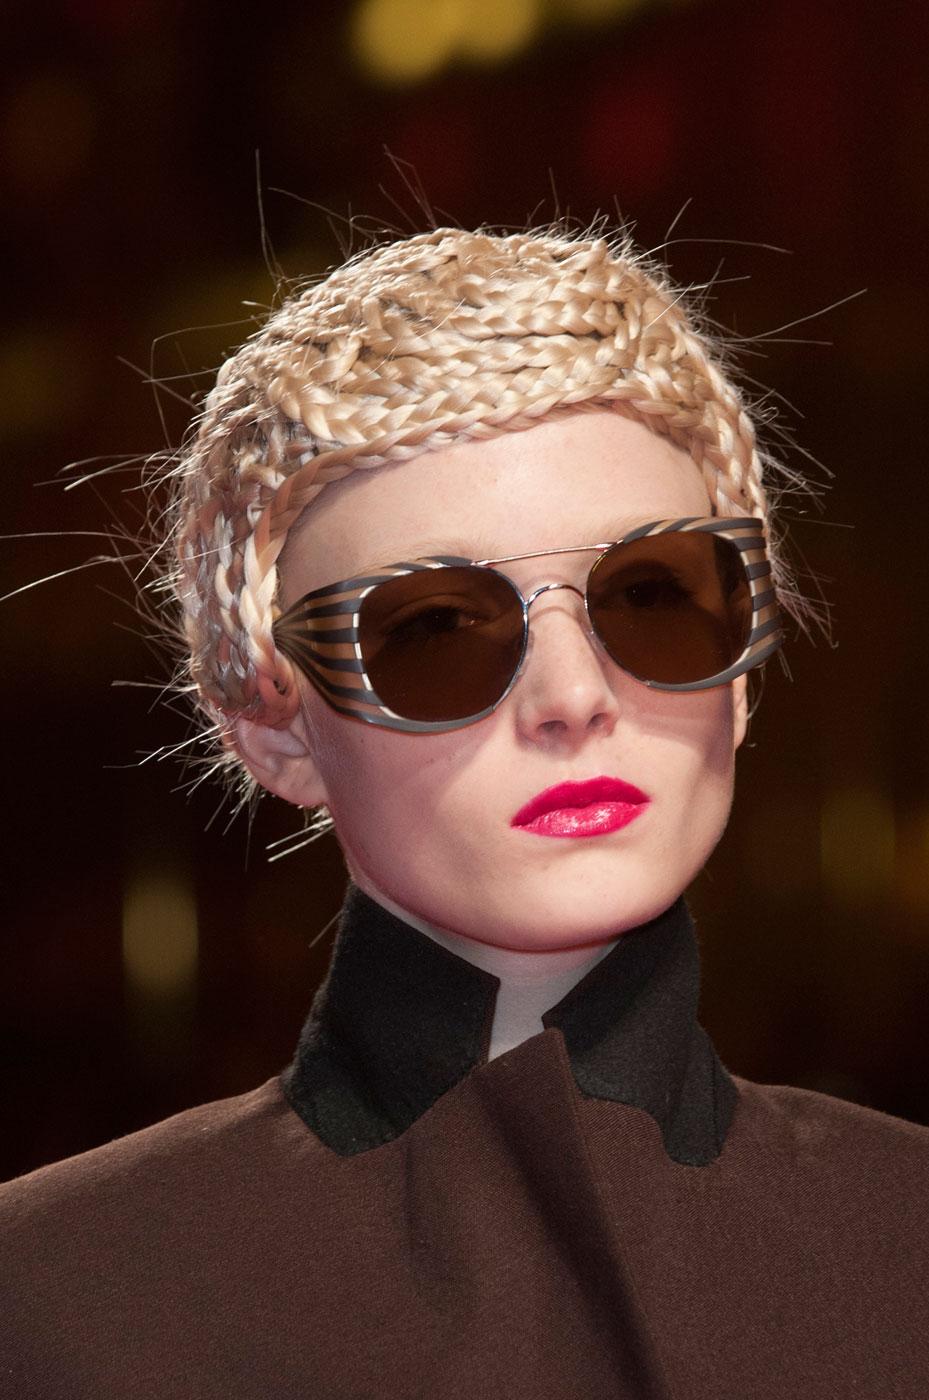 Schiaparelli-fashion-runway-show-close-ups-haute-couture-paris-spring-summer-2015-the-impression-23